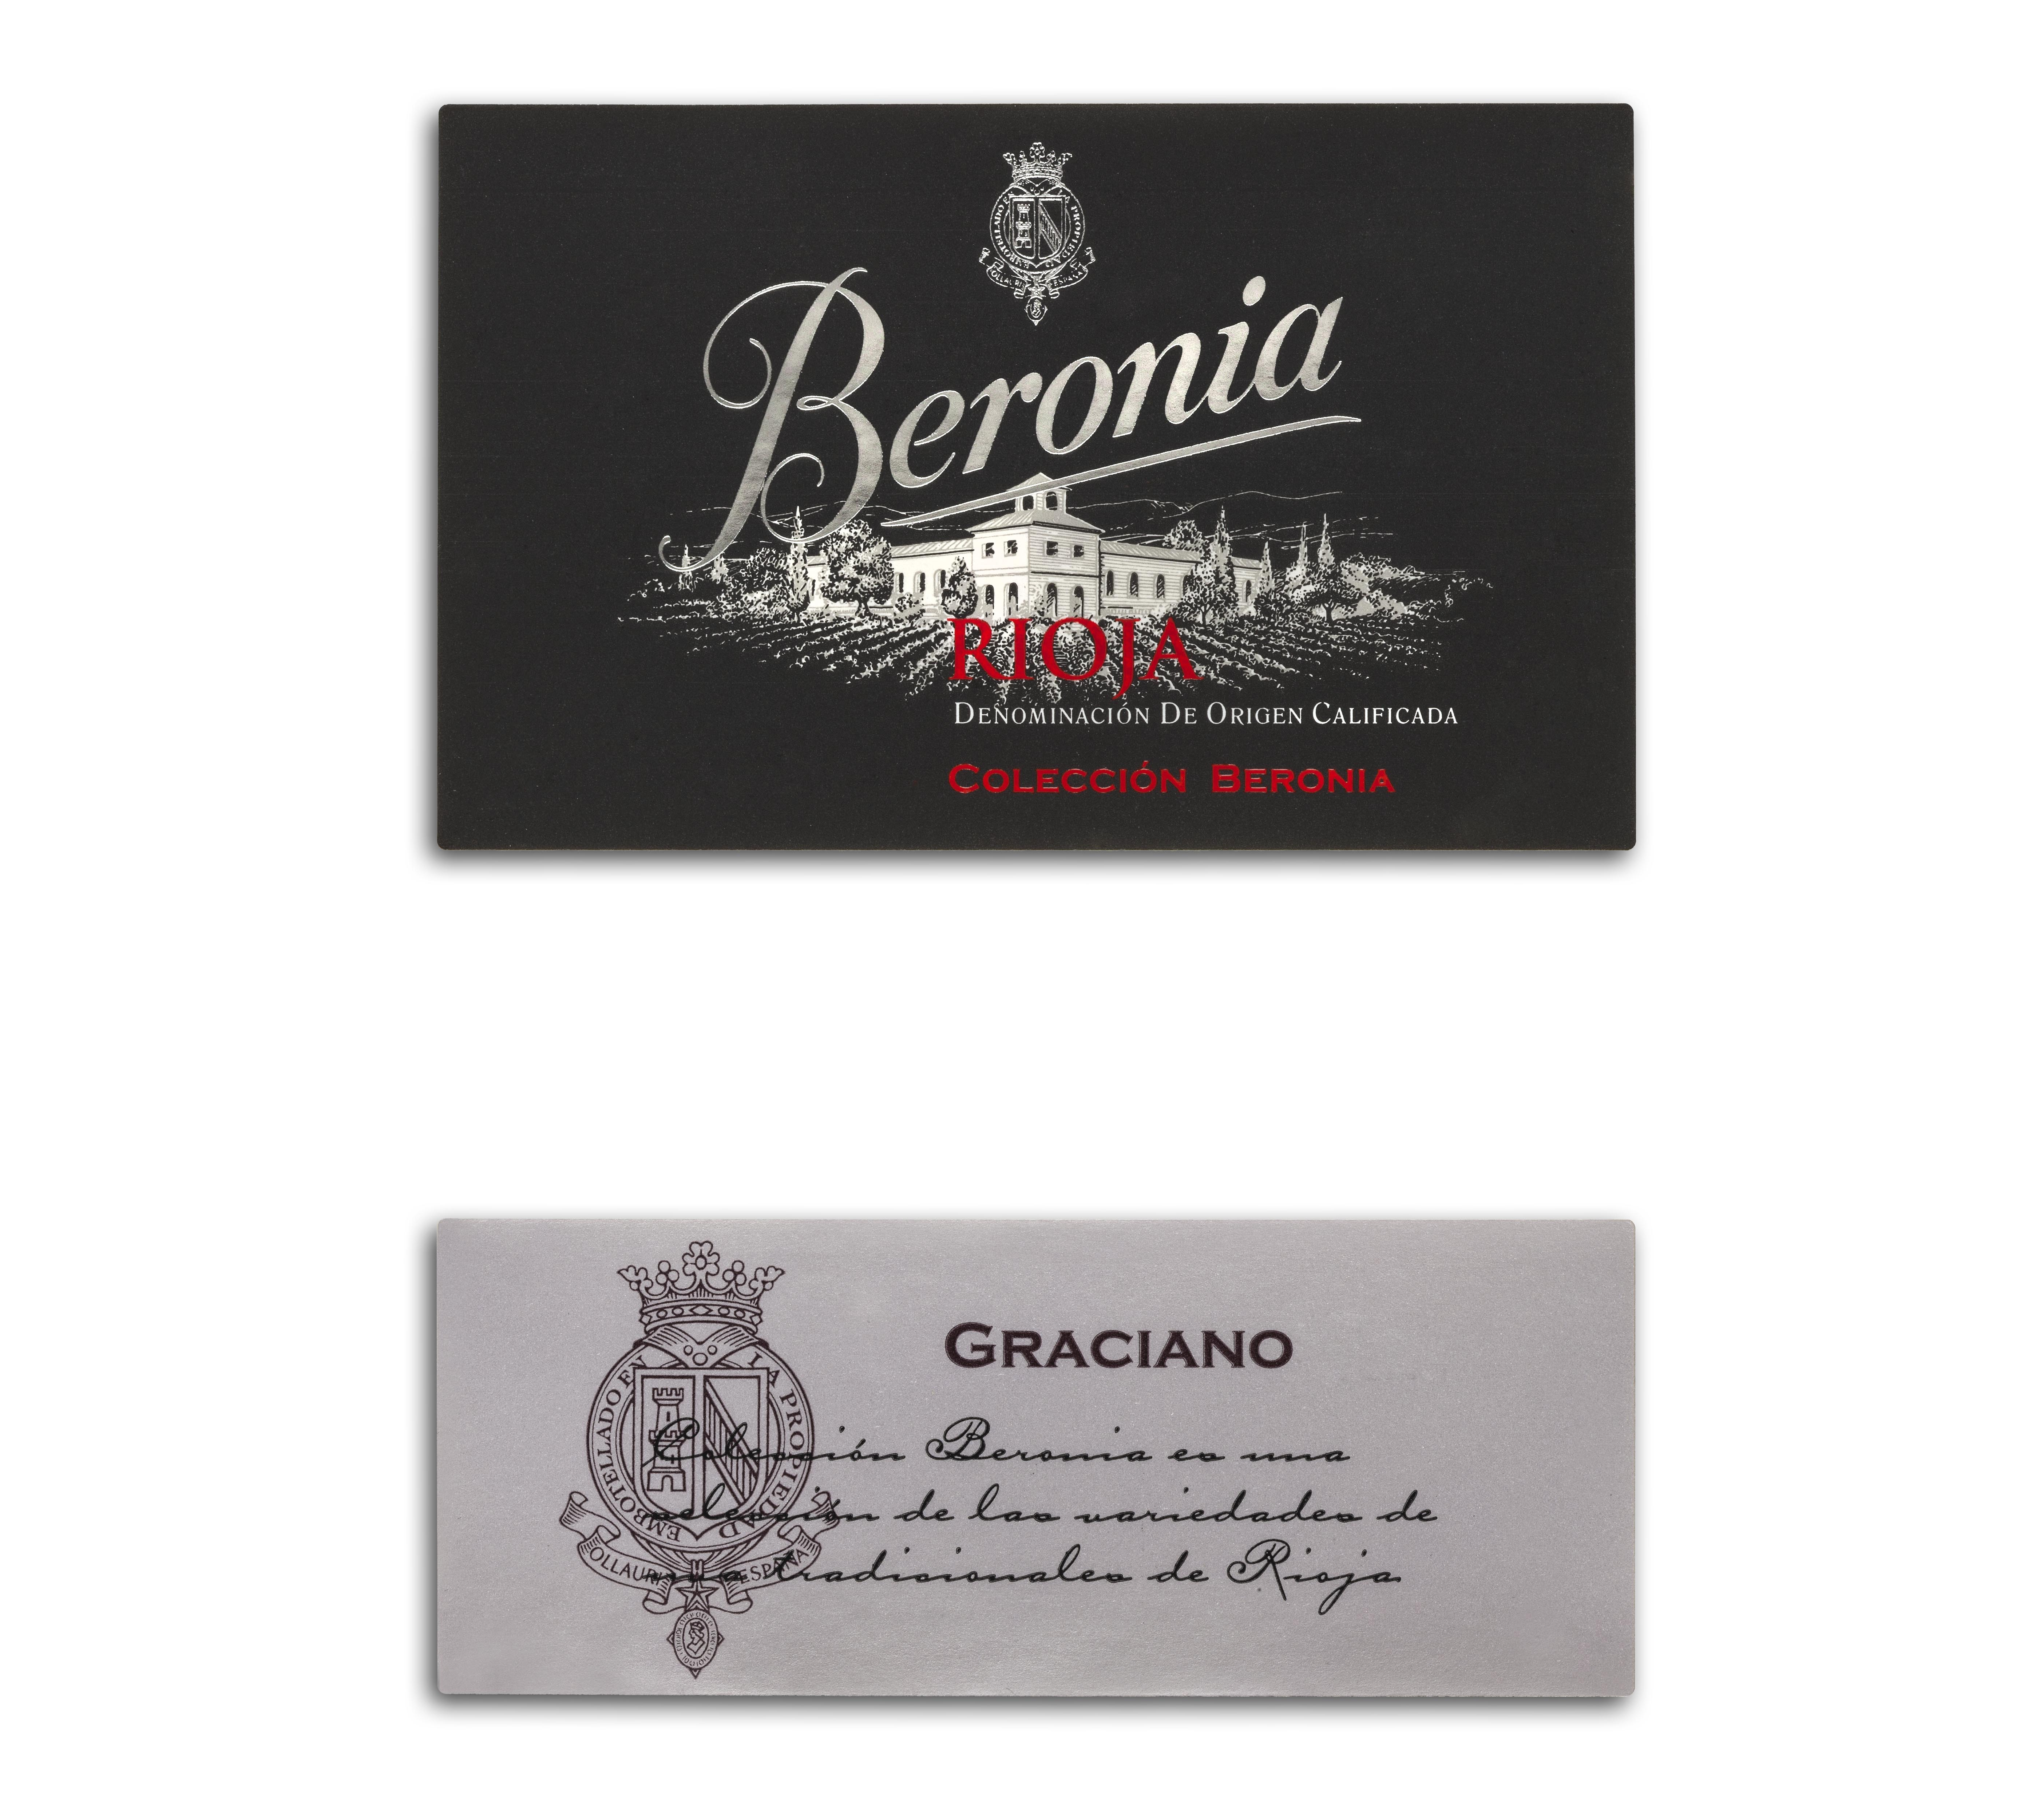 Beronia Graciano